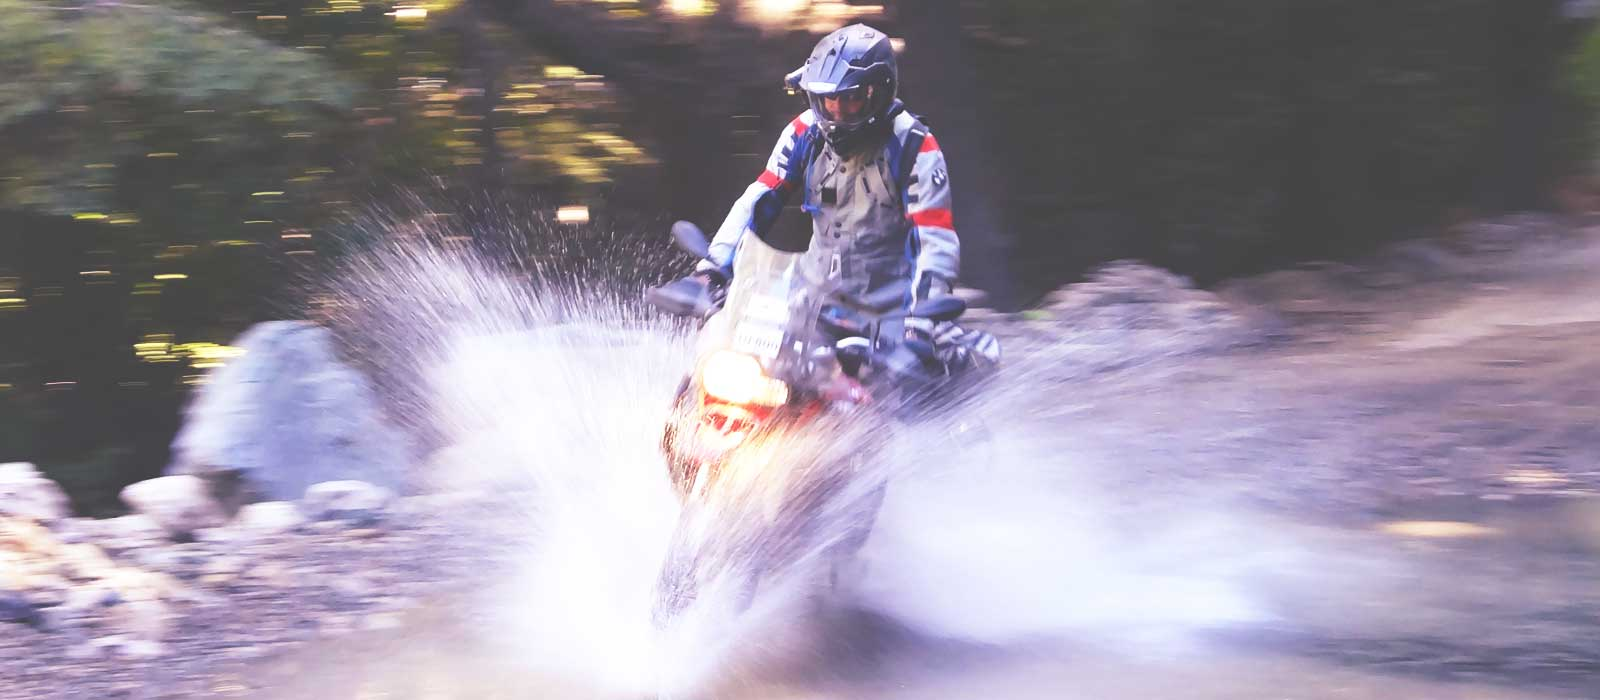 ride-hero-NorthPatagonia.jpg